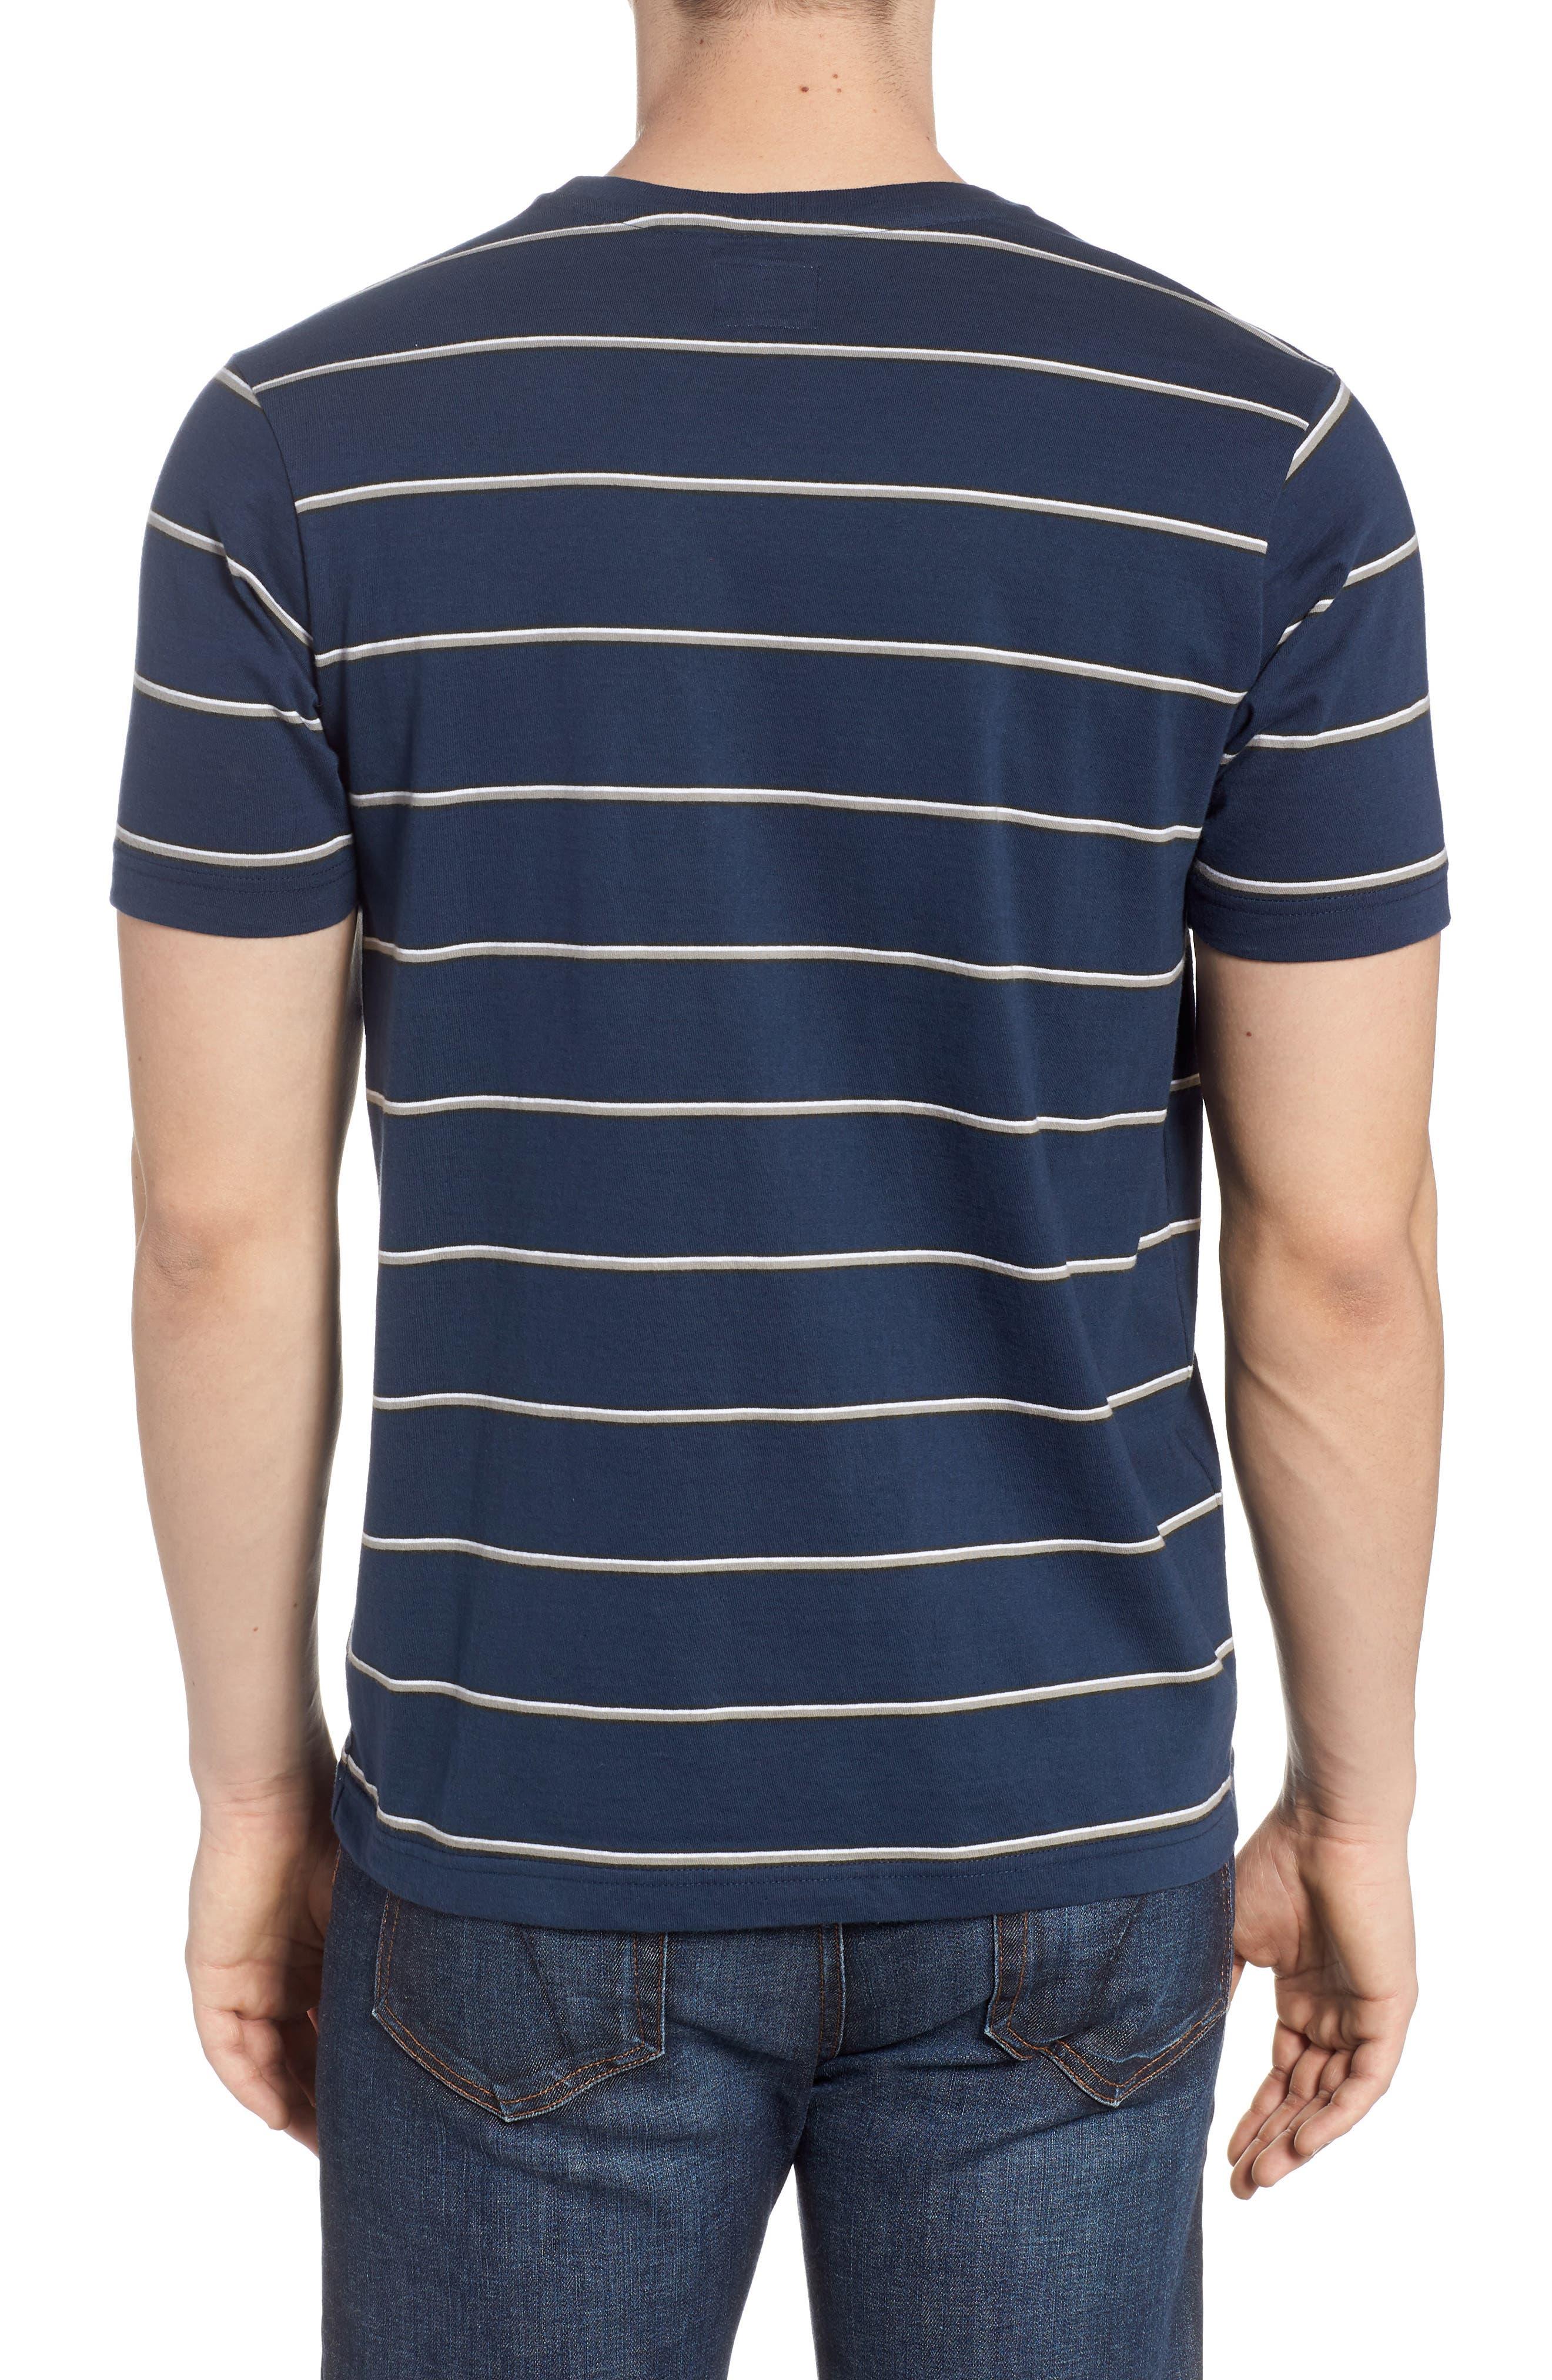 Prospect T-Shirt,                             Alternate thumbnail 5, color,